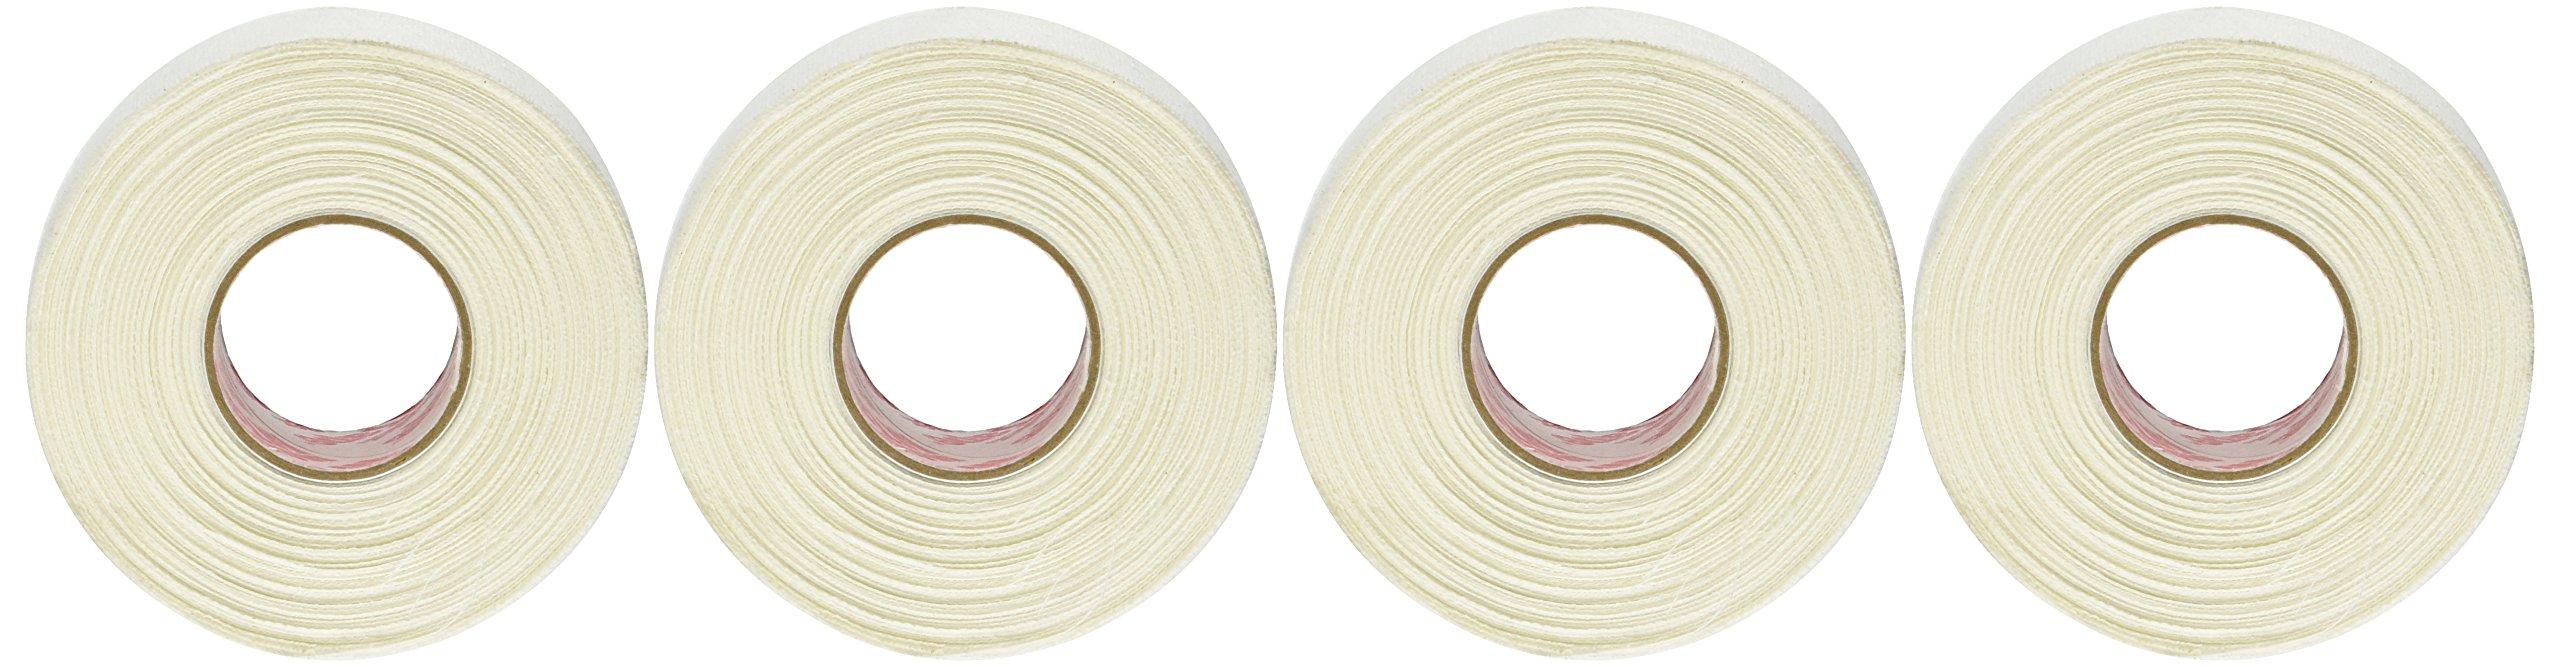 Mueller Athletic Tape, 1.5'' X 15yds White, 4 pack